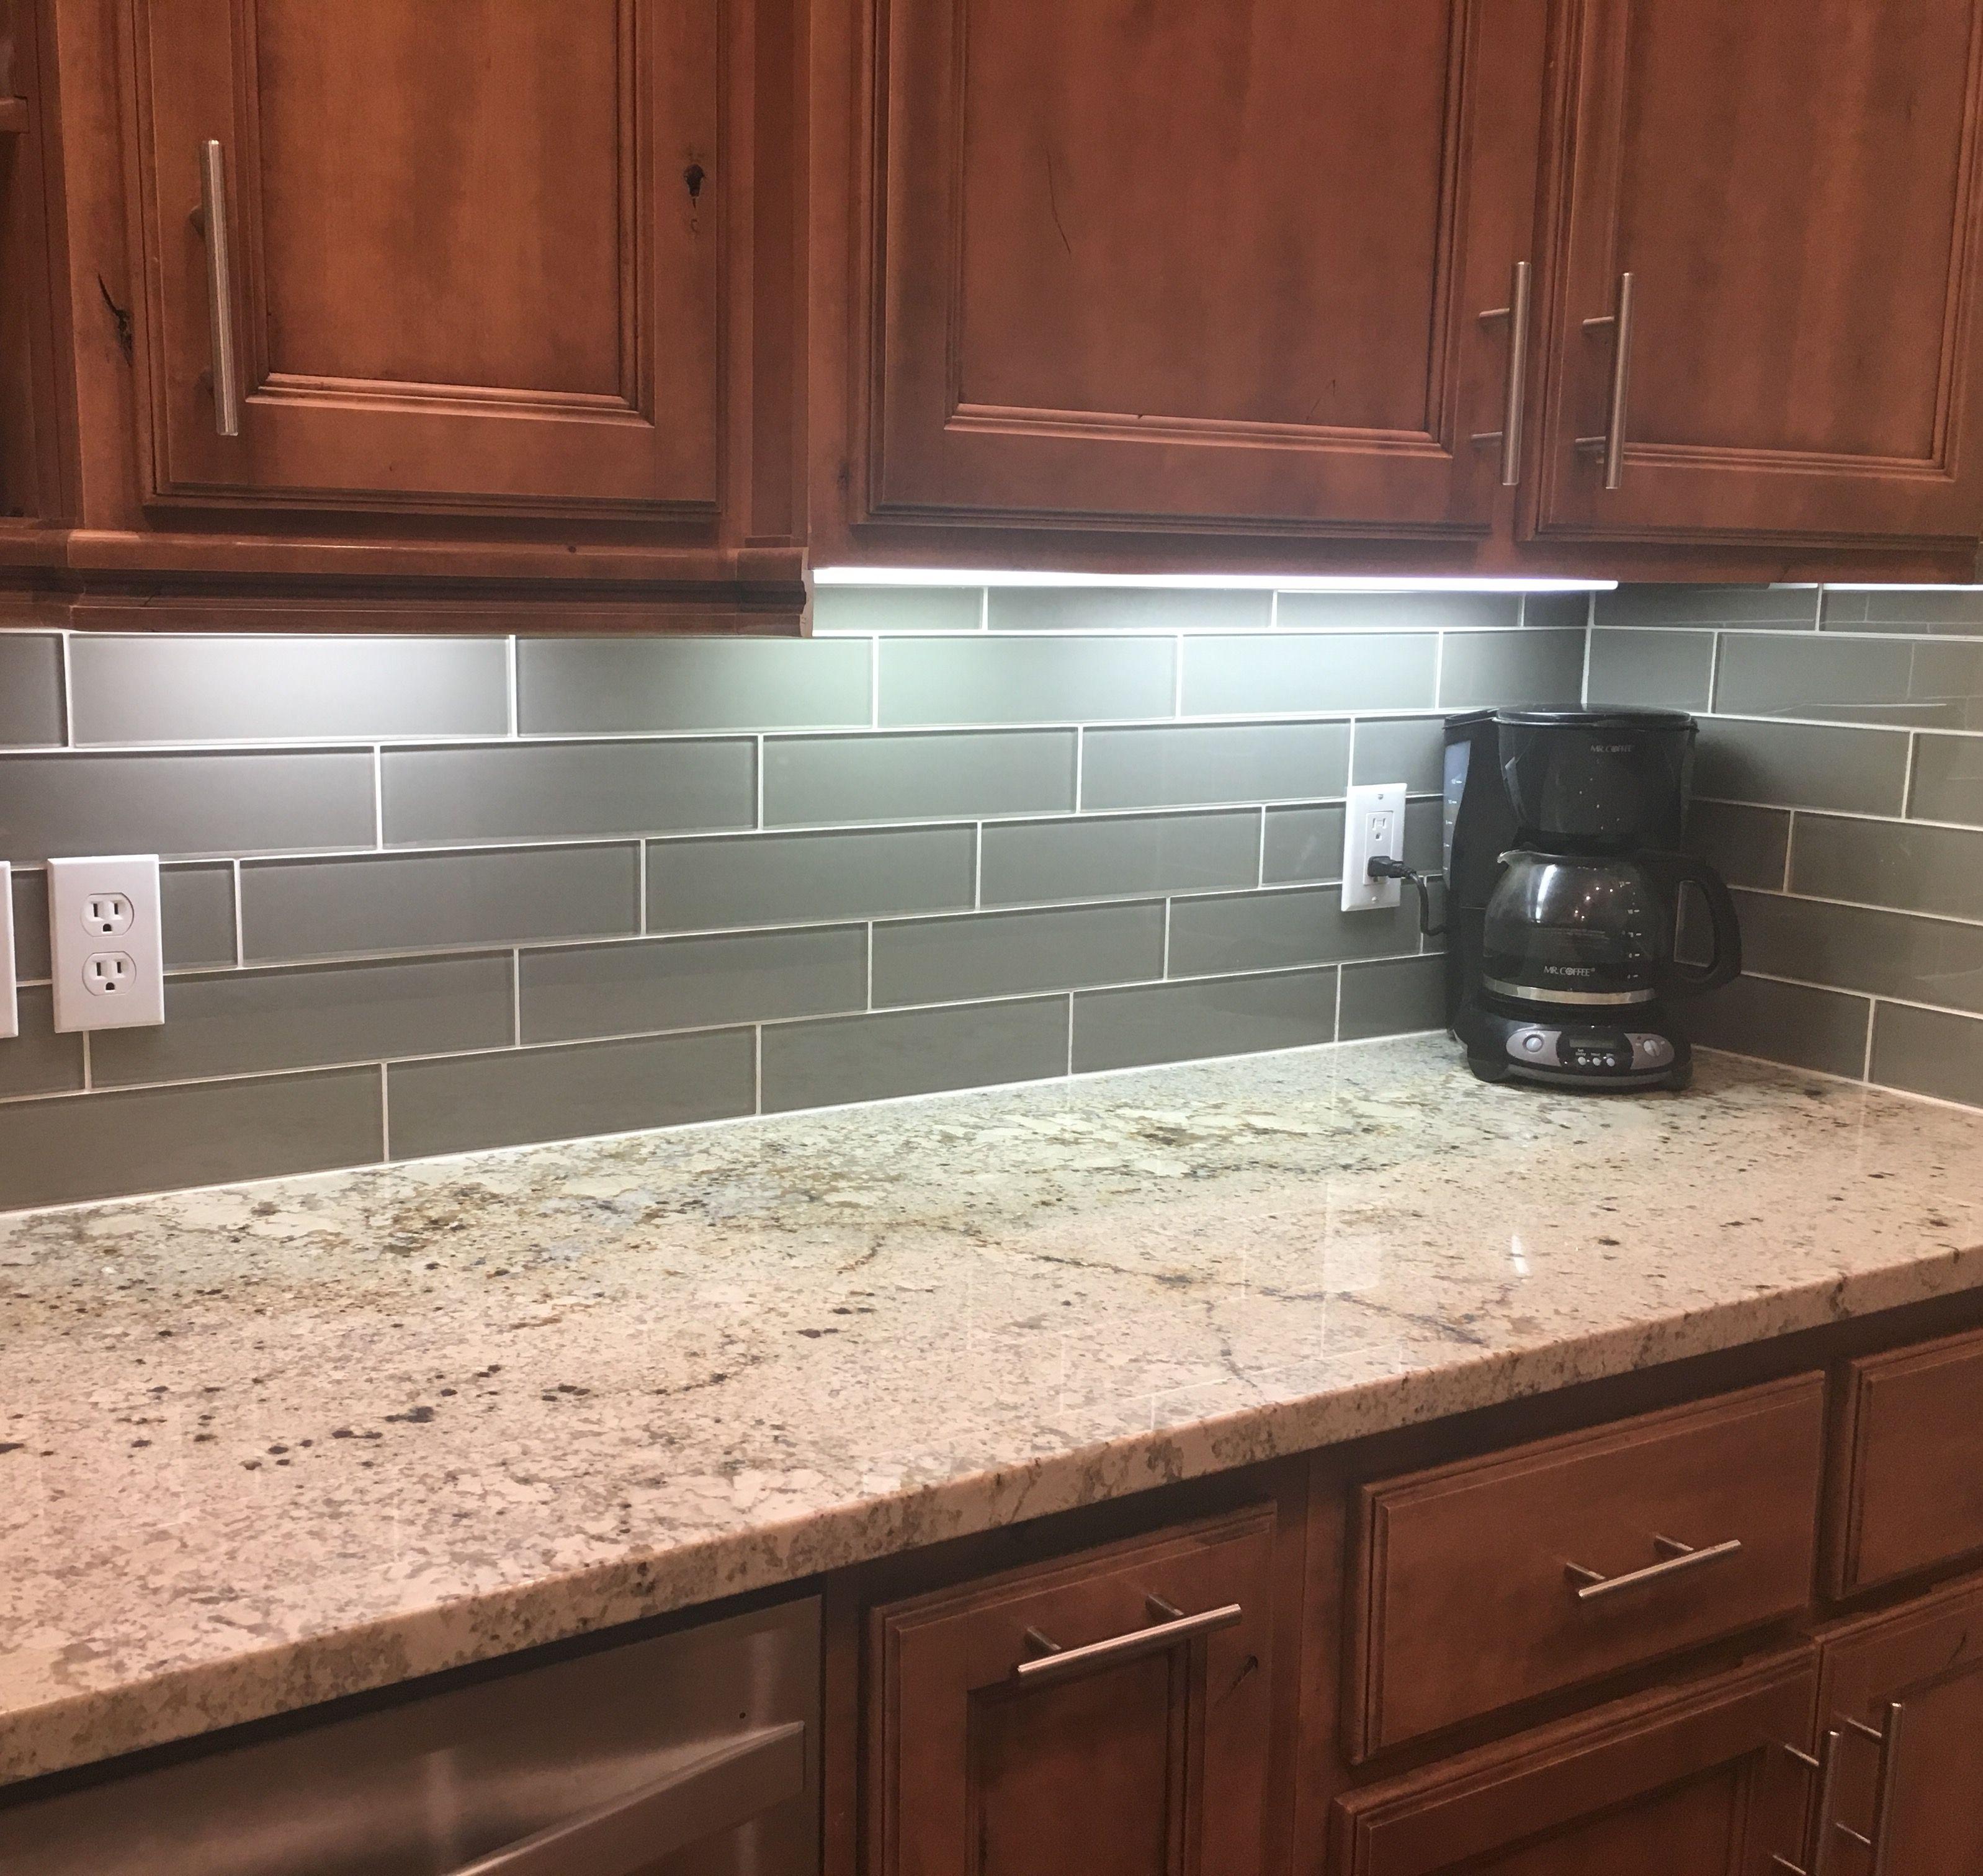 - The Glass Smoke Subway Tile Backsplash Is Finally Done! Kitchen